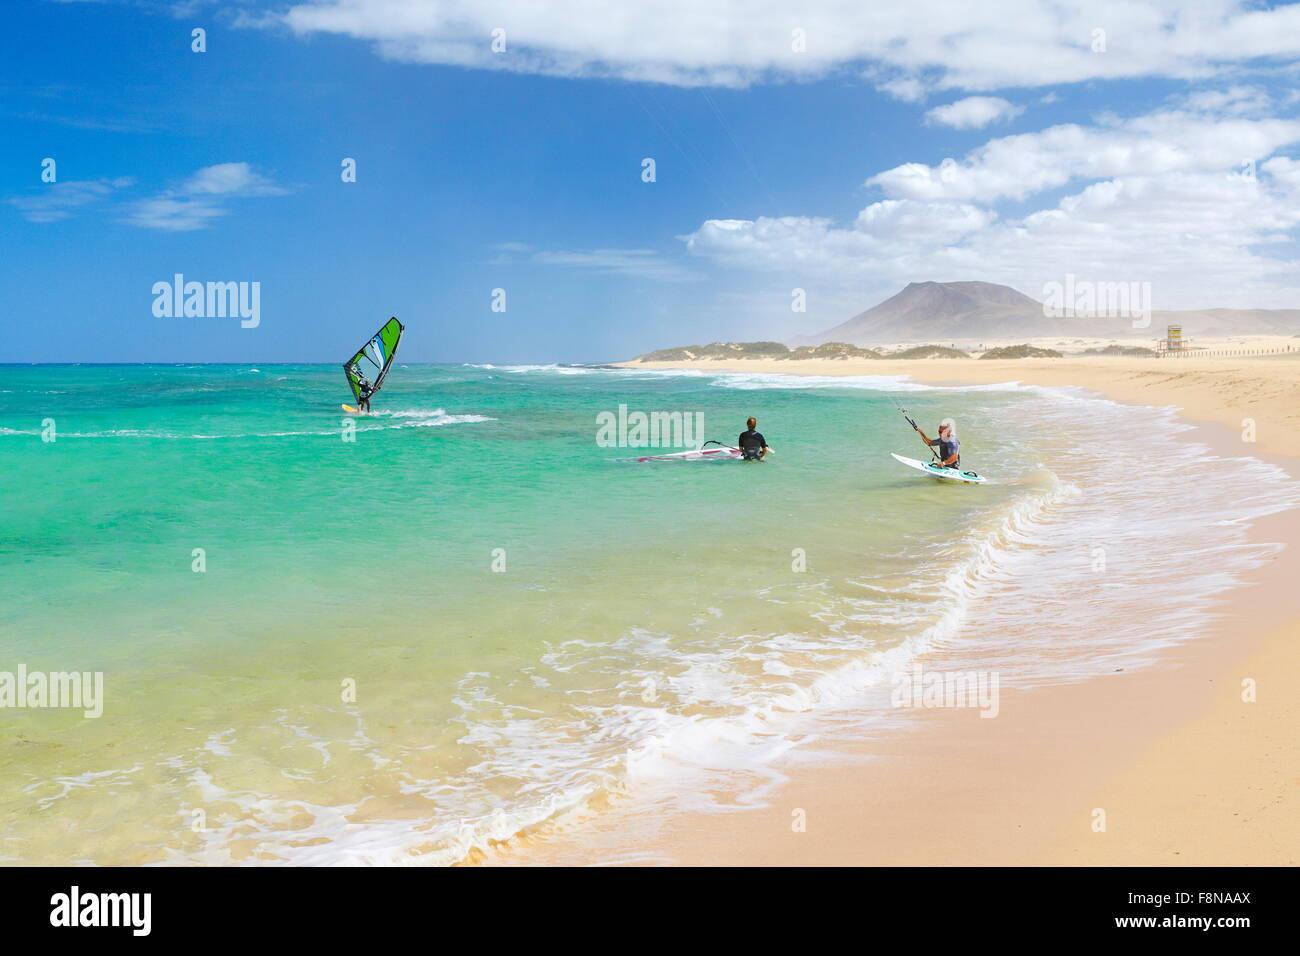 Windsurfing at the Corralejo Beach, Fuerteventura Island